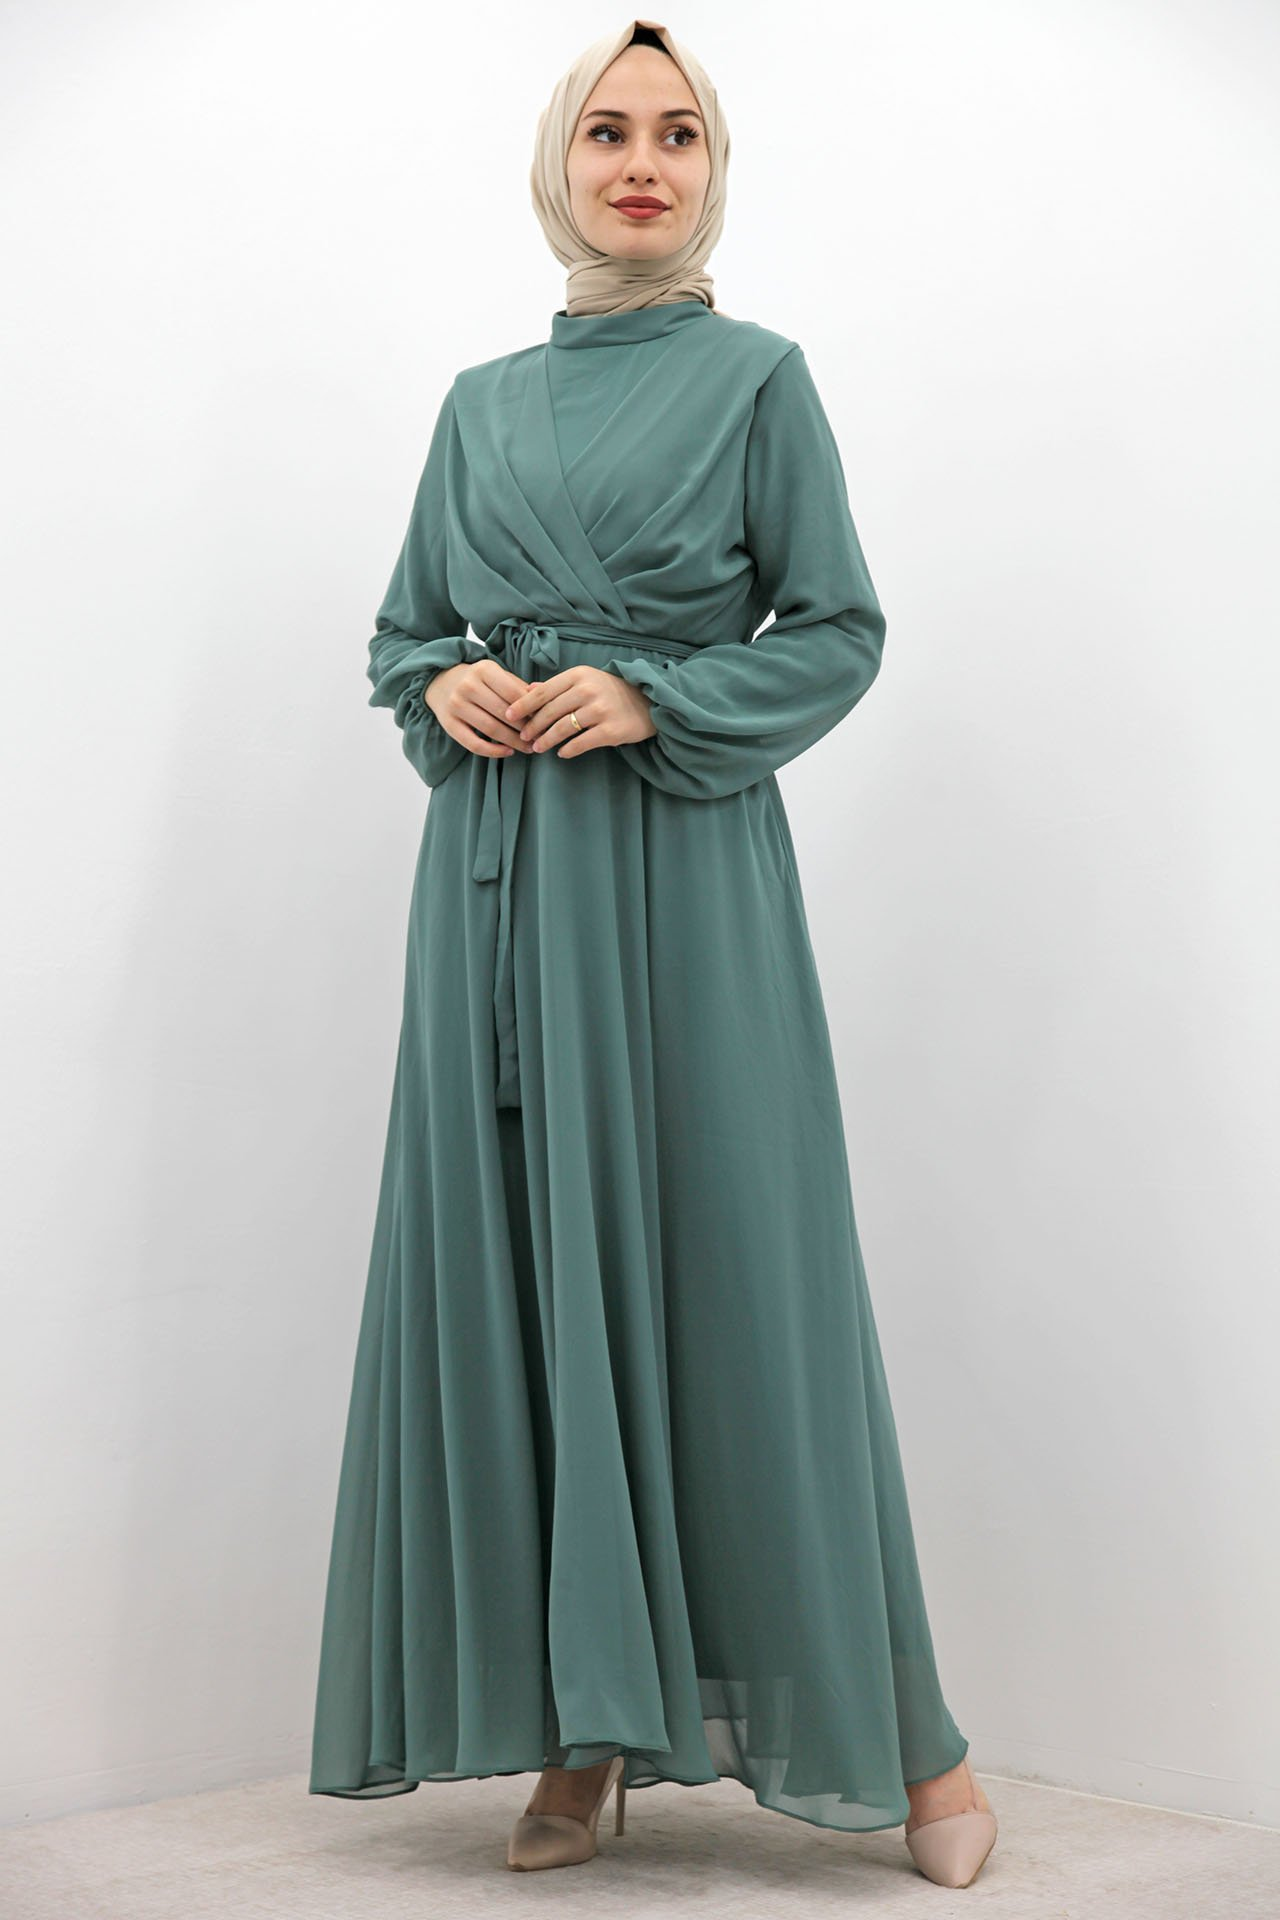 GİZAGİYİM - Önü Çarpraz Şifon Elbise Mint